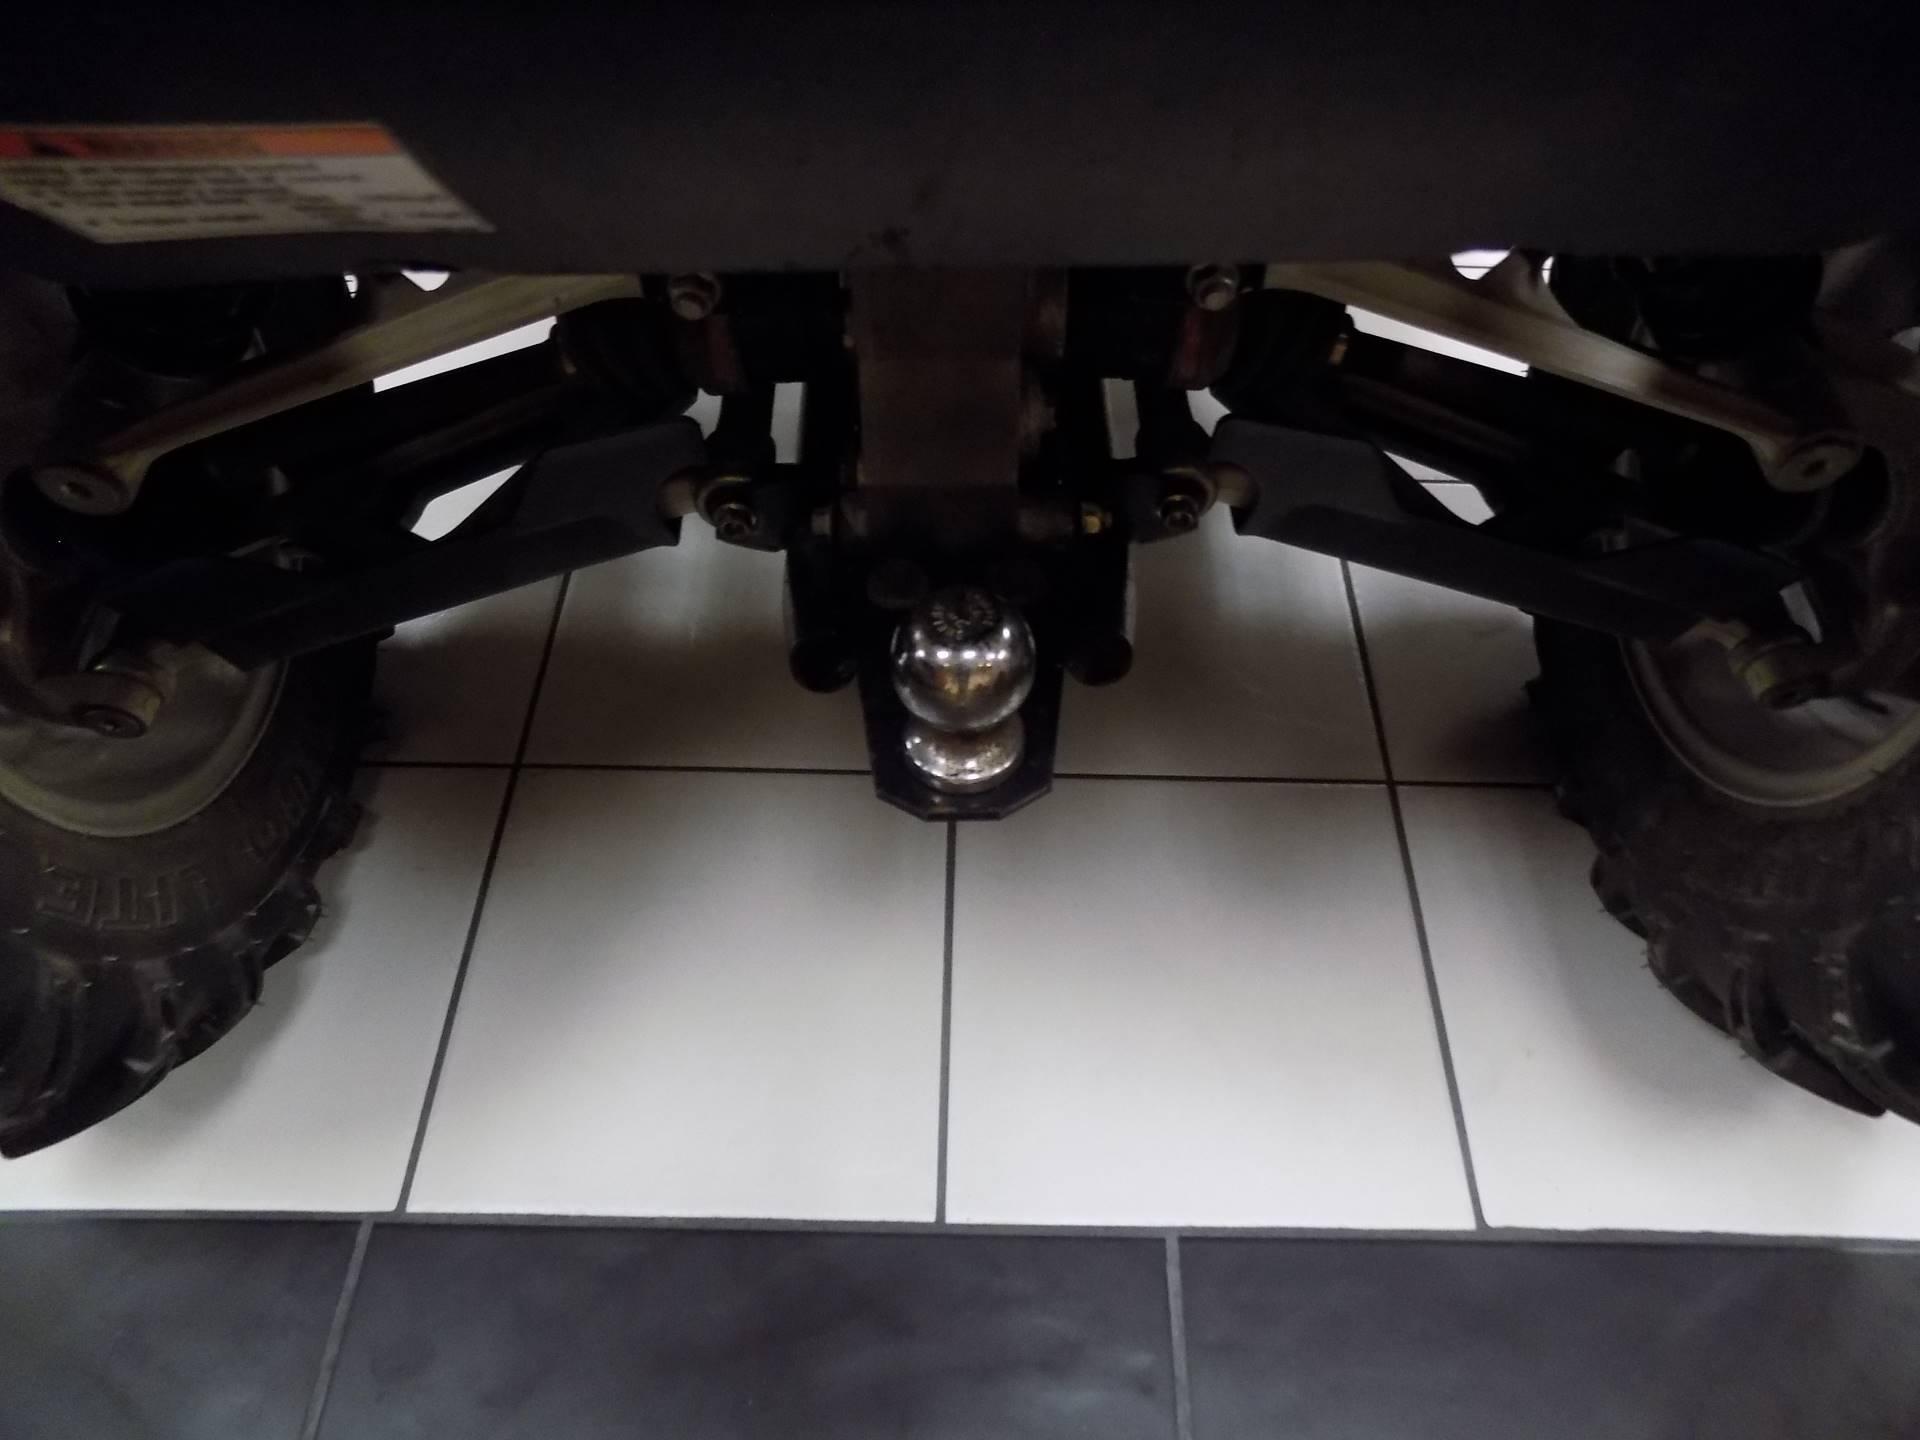 2007 Honda FourTrax Rincon 6